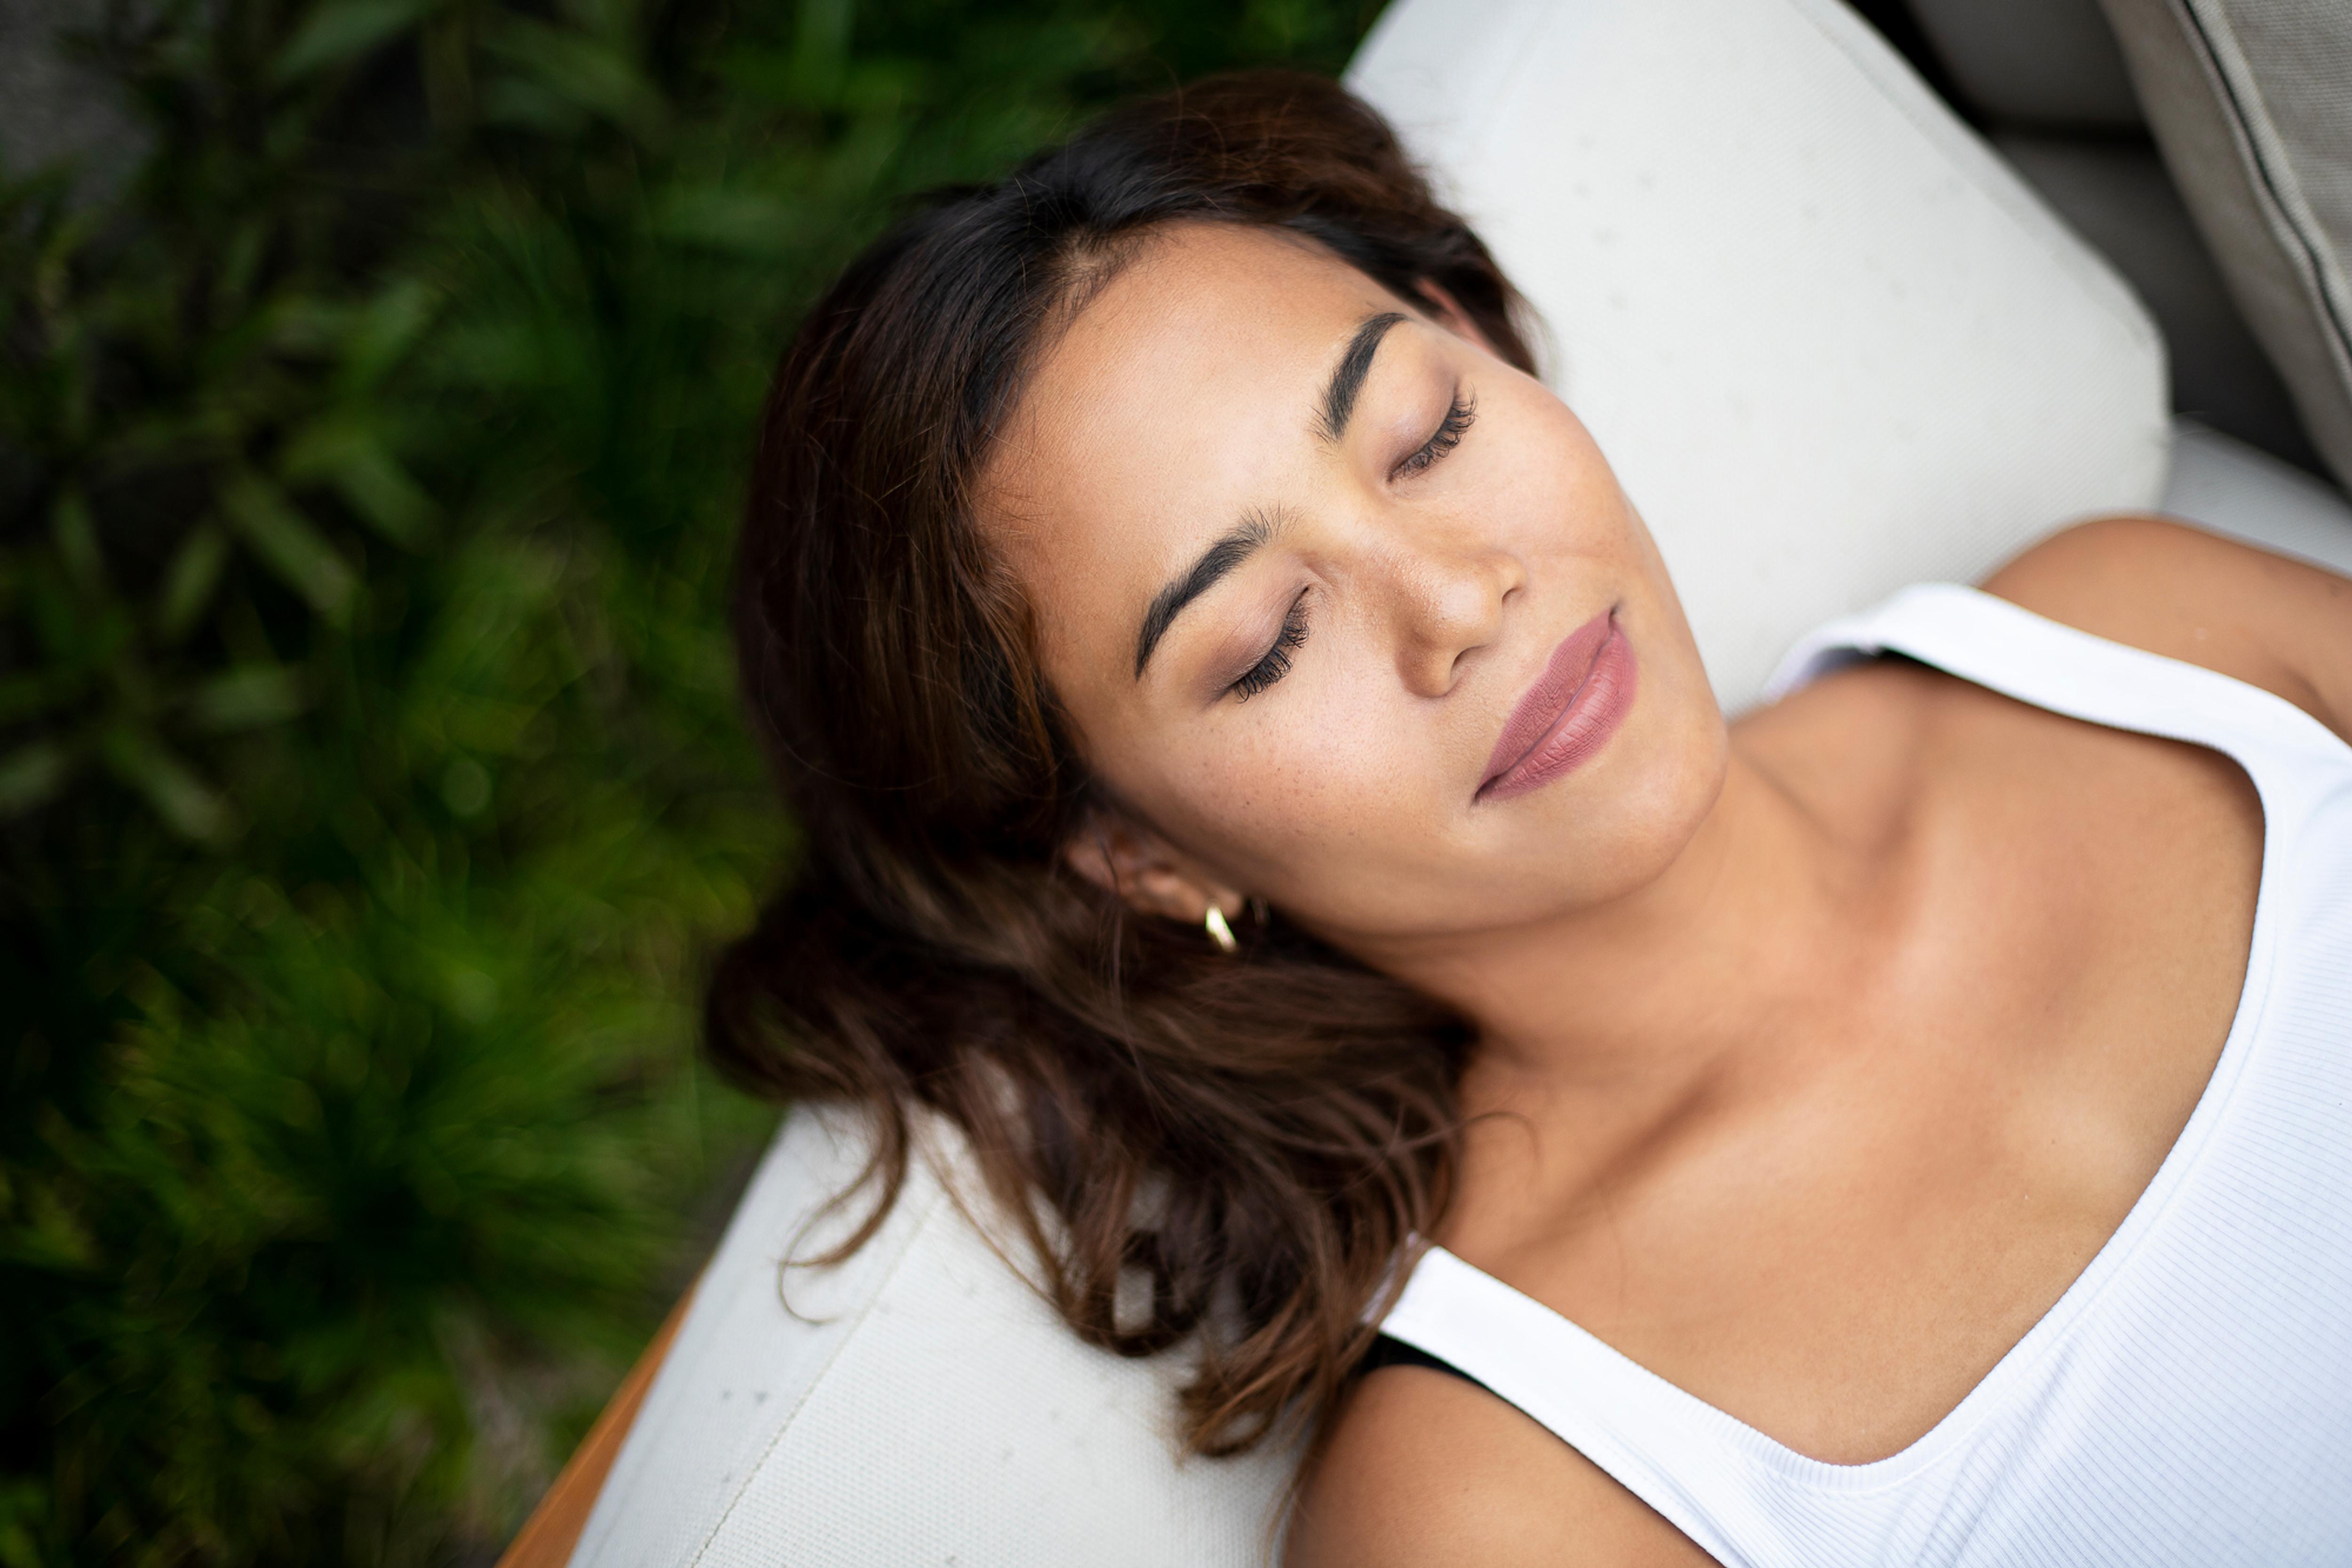 Relaxation/Therapeutic Massage